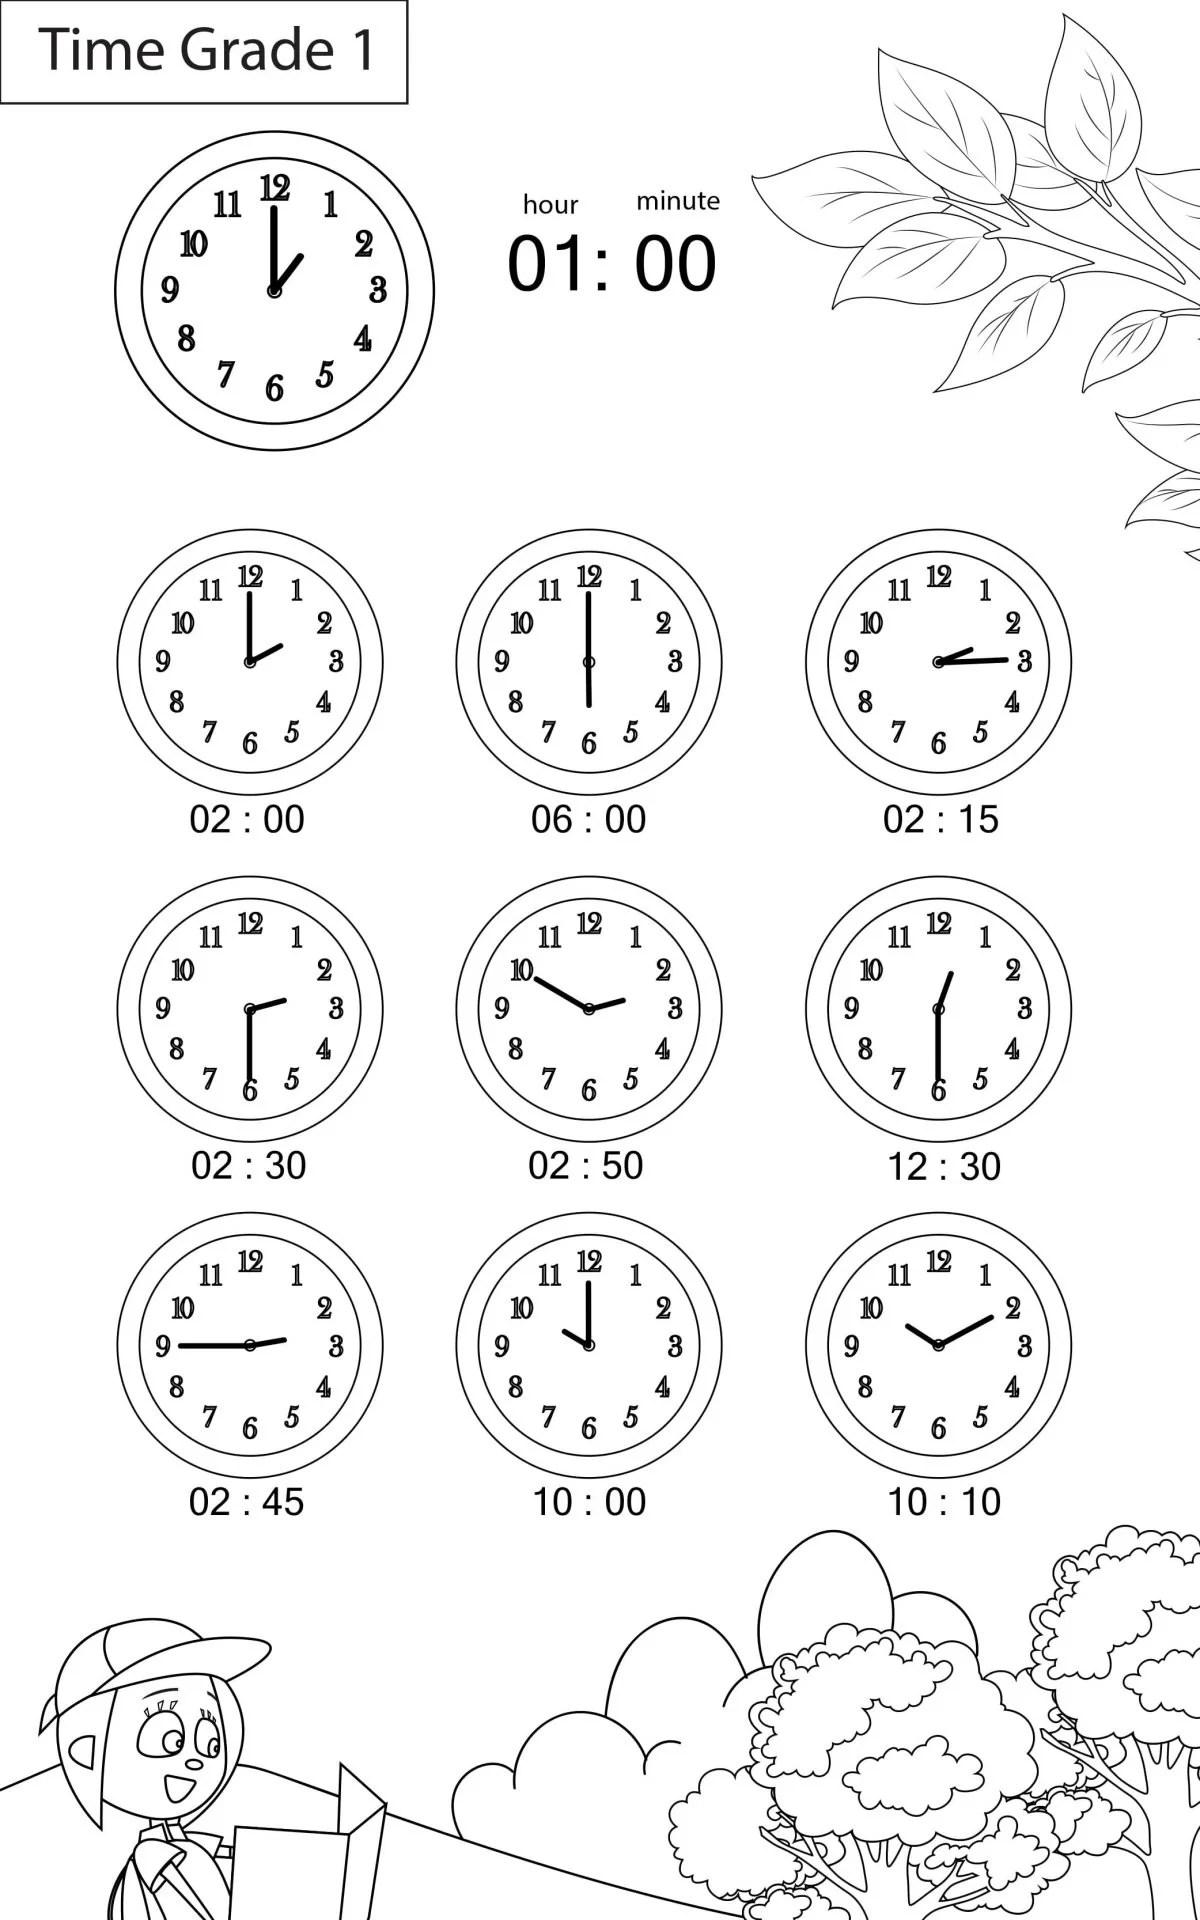 Maths Worksheets Grade 1 Chapter Time